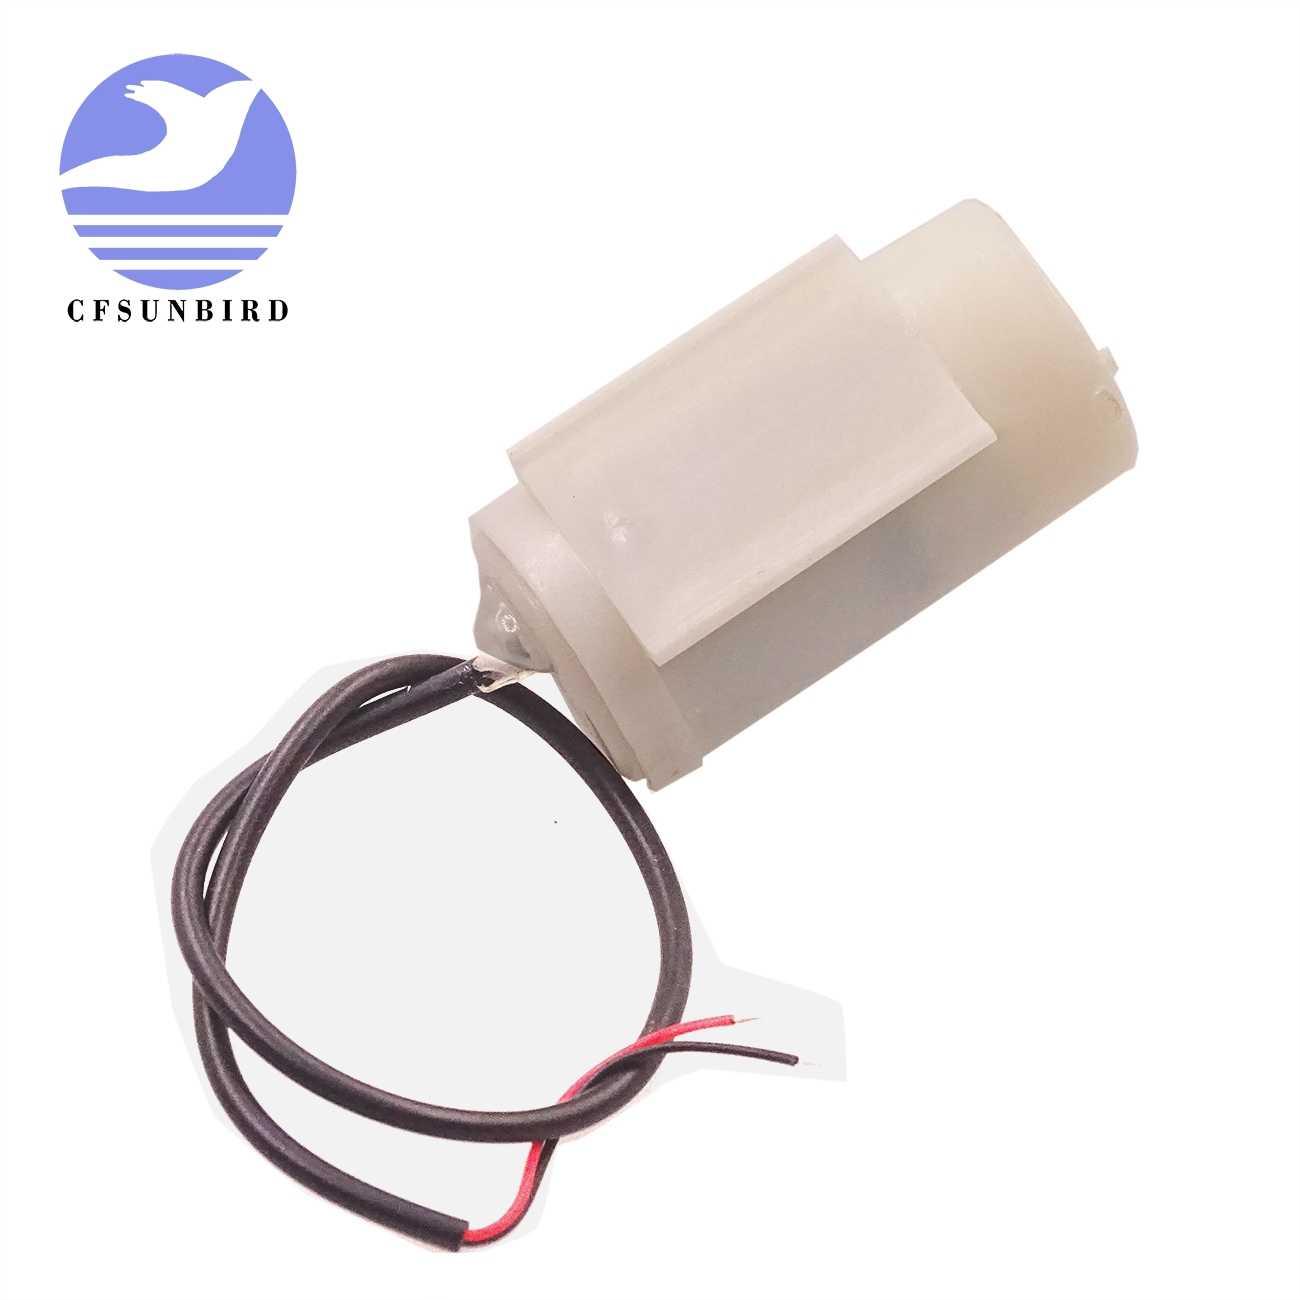 1 piezas mudo Mini Micro Motor sumergible de la bomba de agua bombas de DC 3-5 V 70-120L/H USB